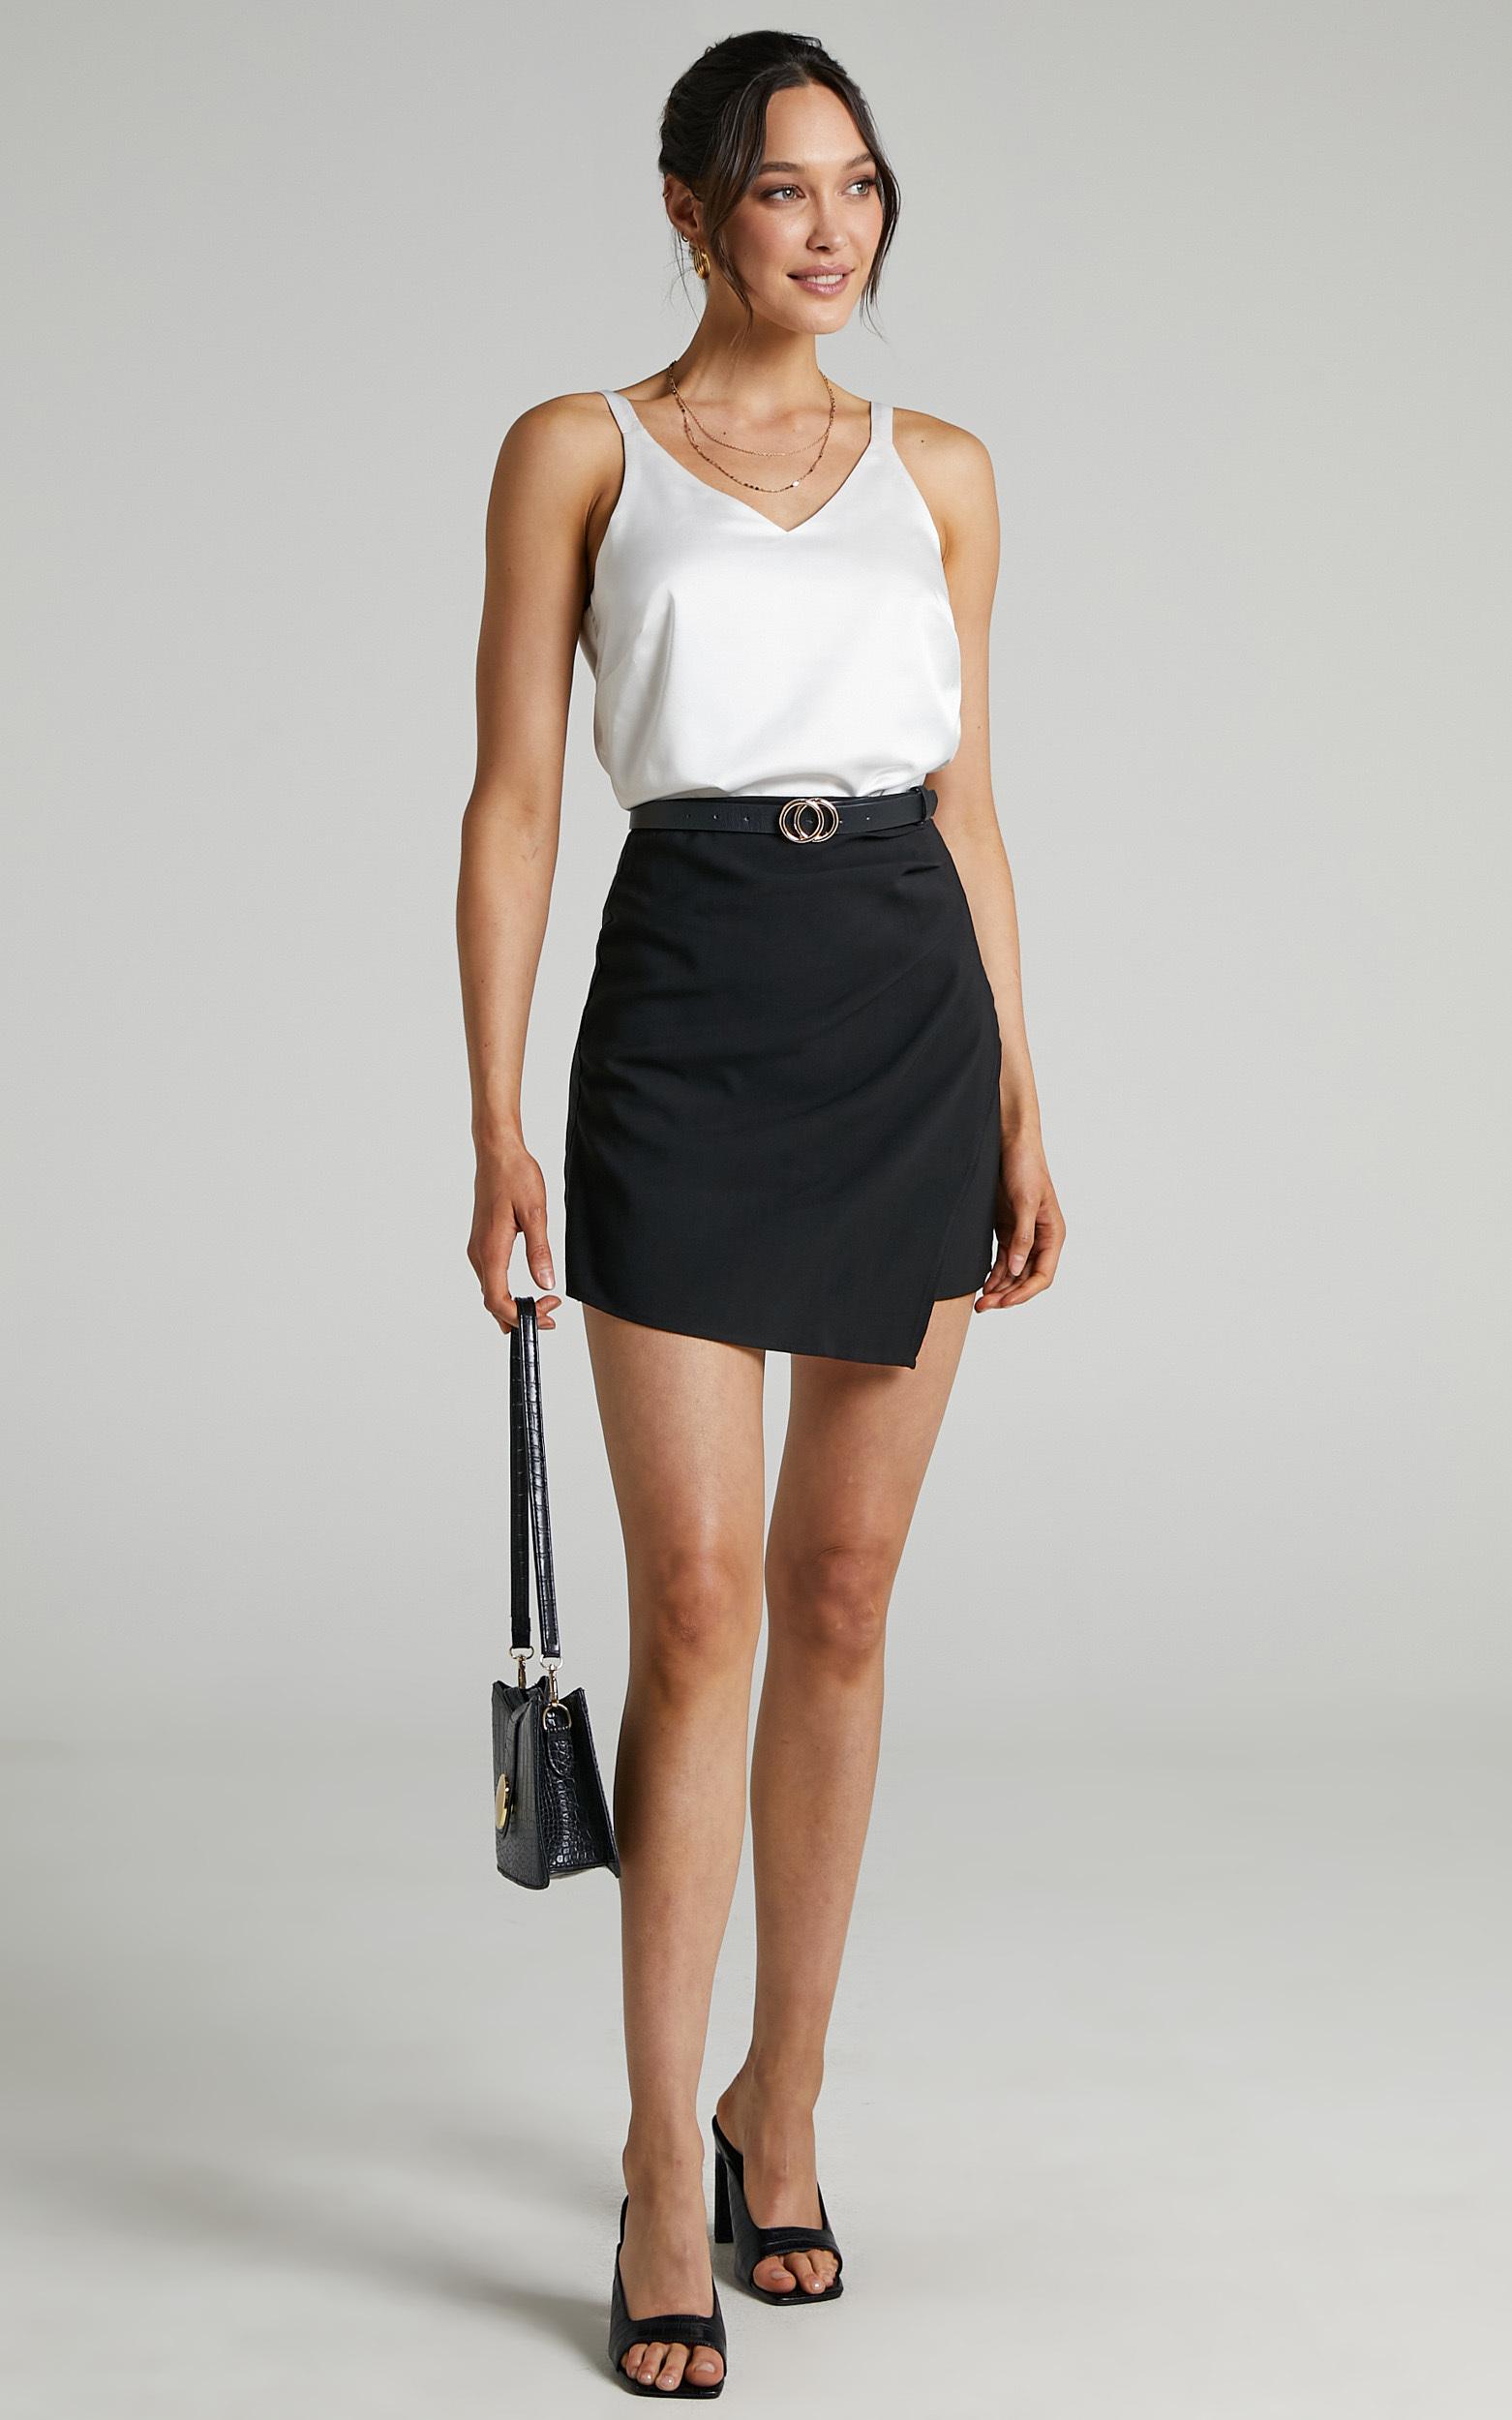 Larra Asymmetrical Pleated Skirt in Black - 04, BLK1, hi-res image number null